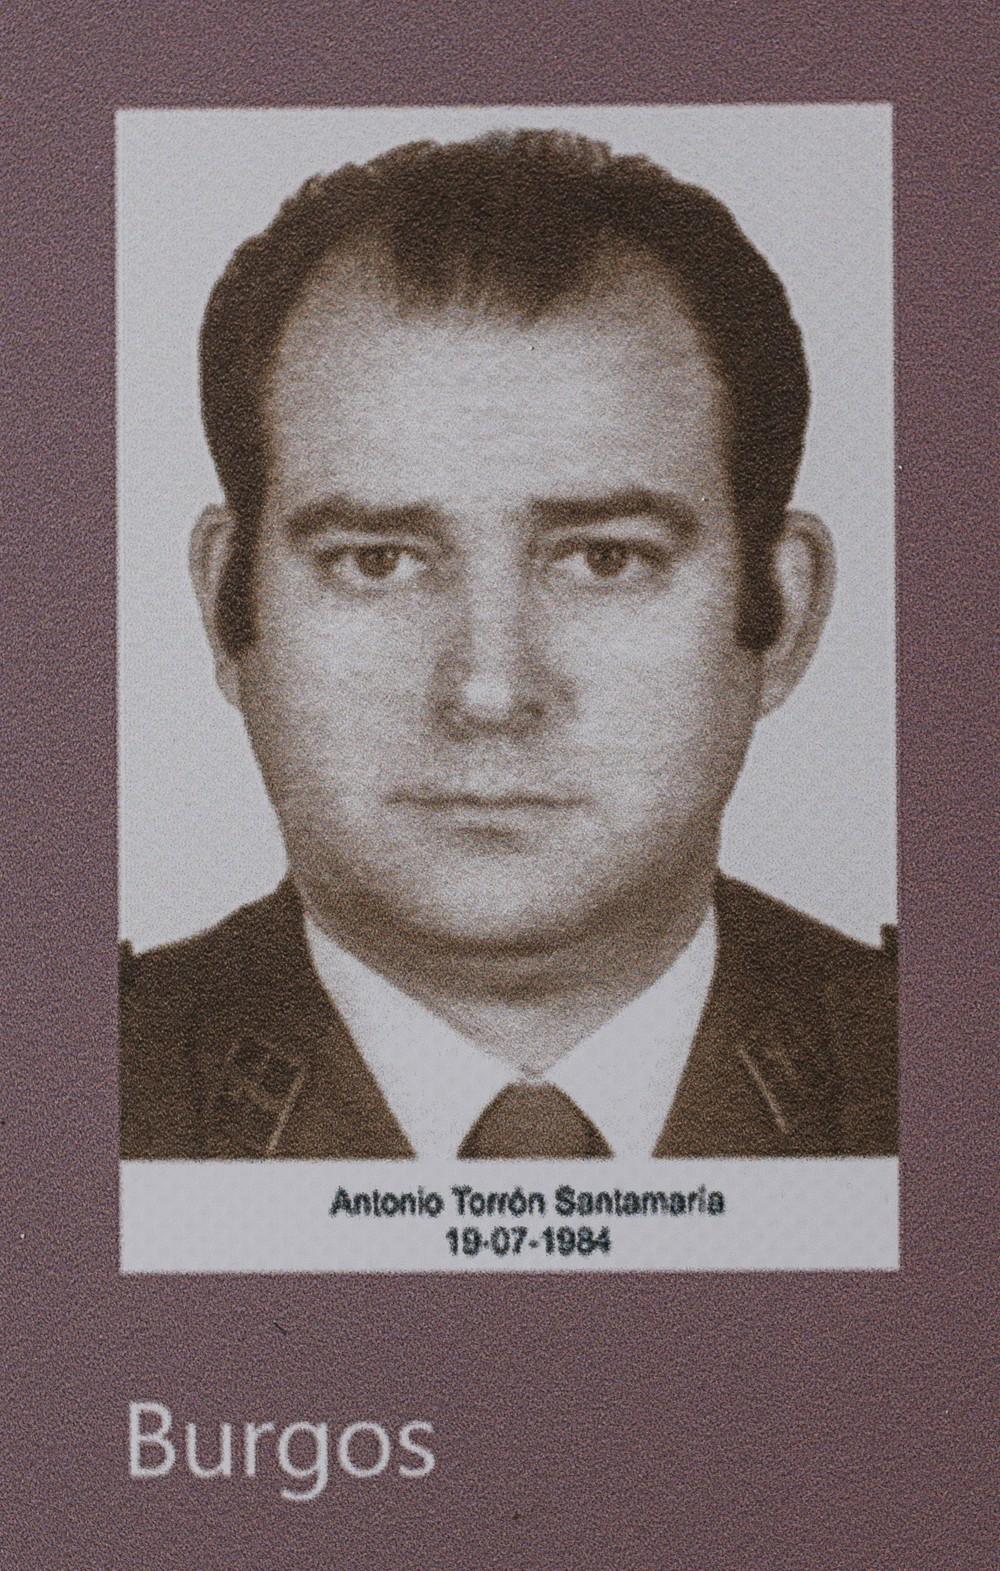 Antonio Torrón